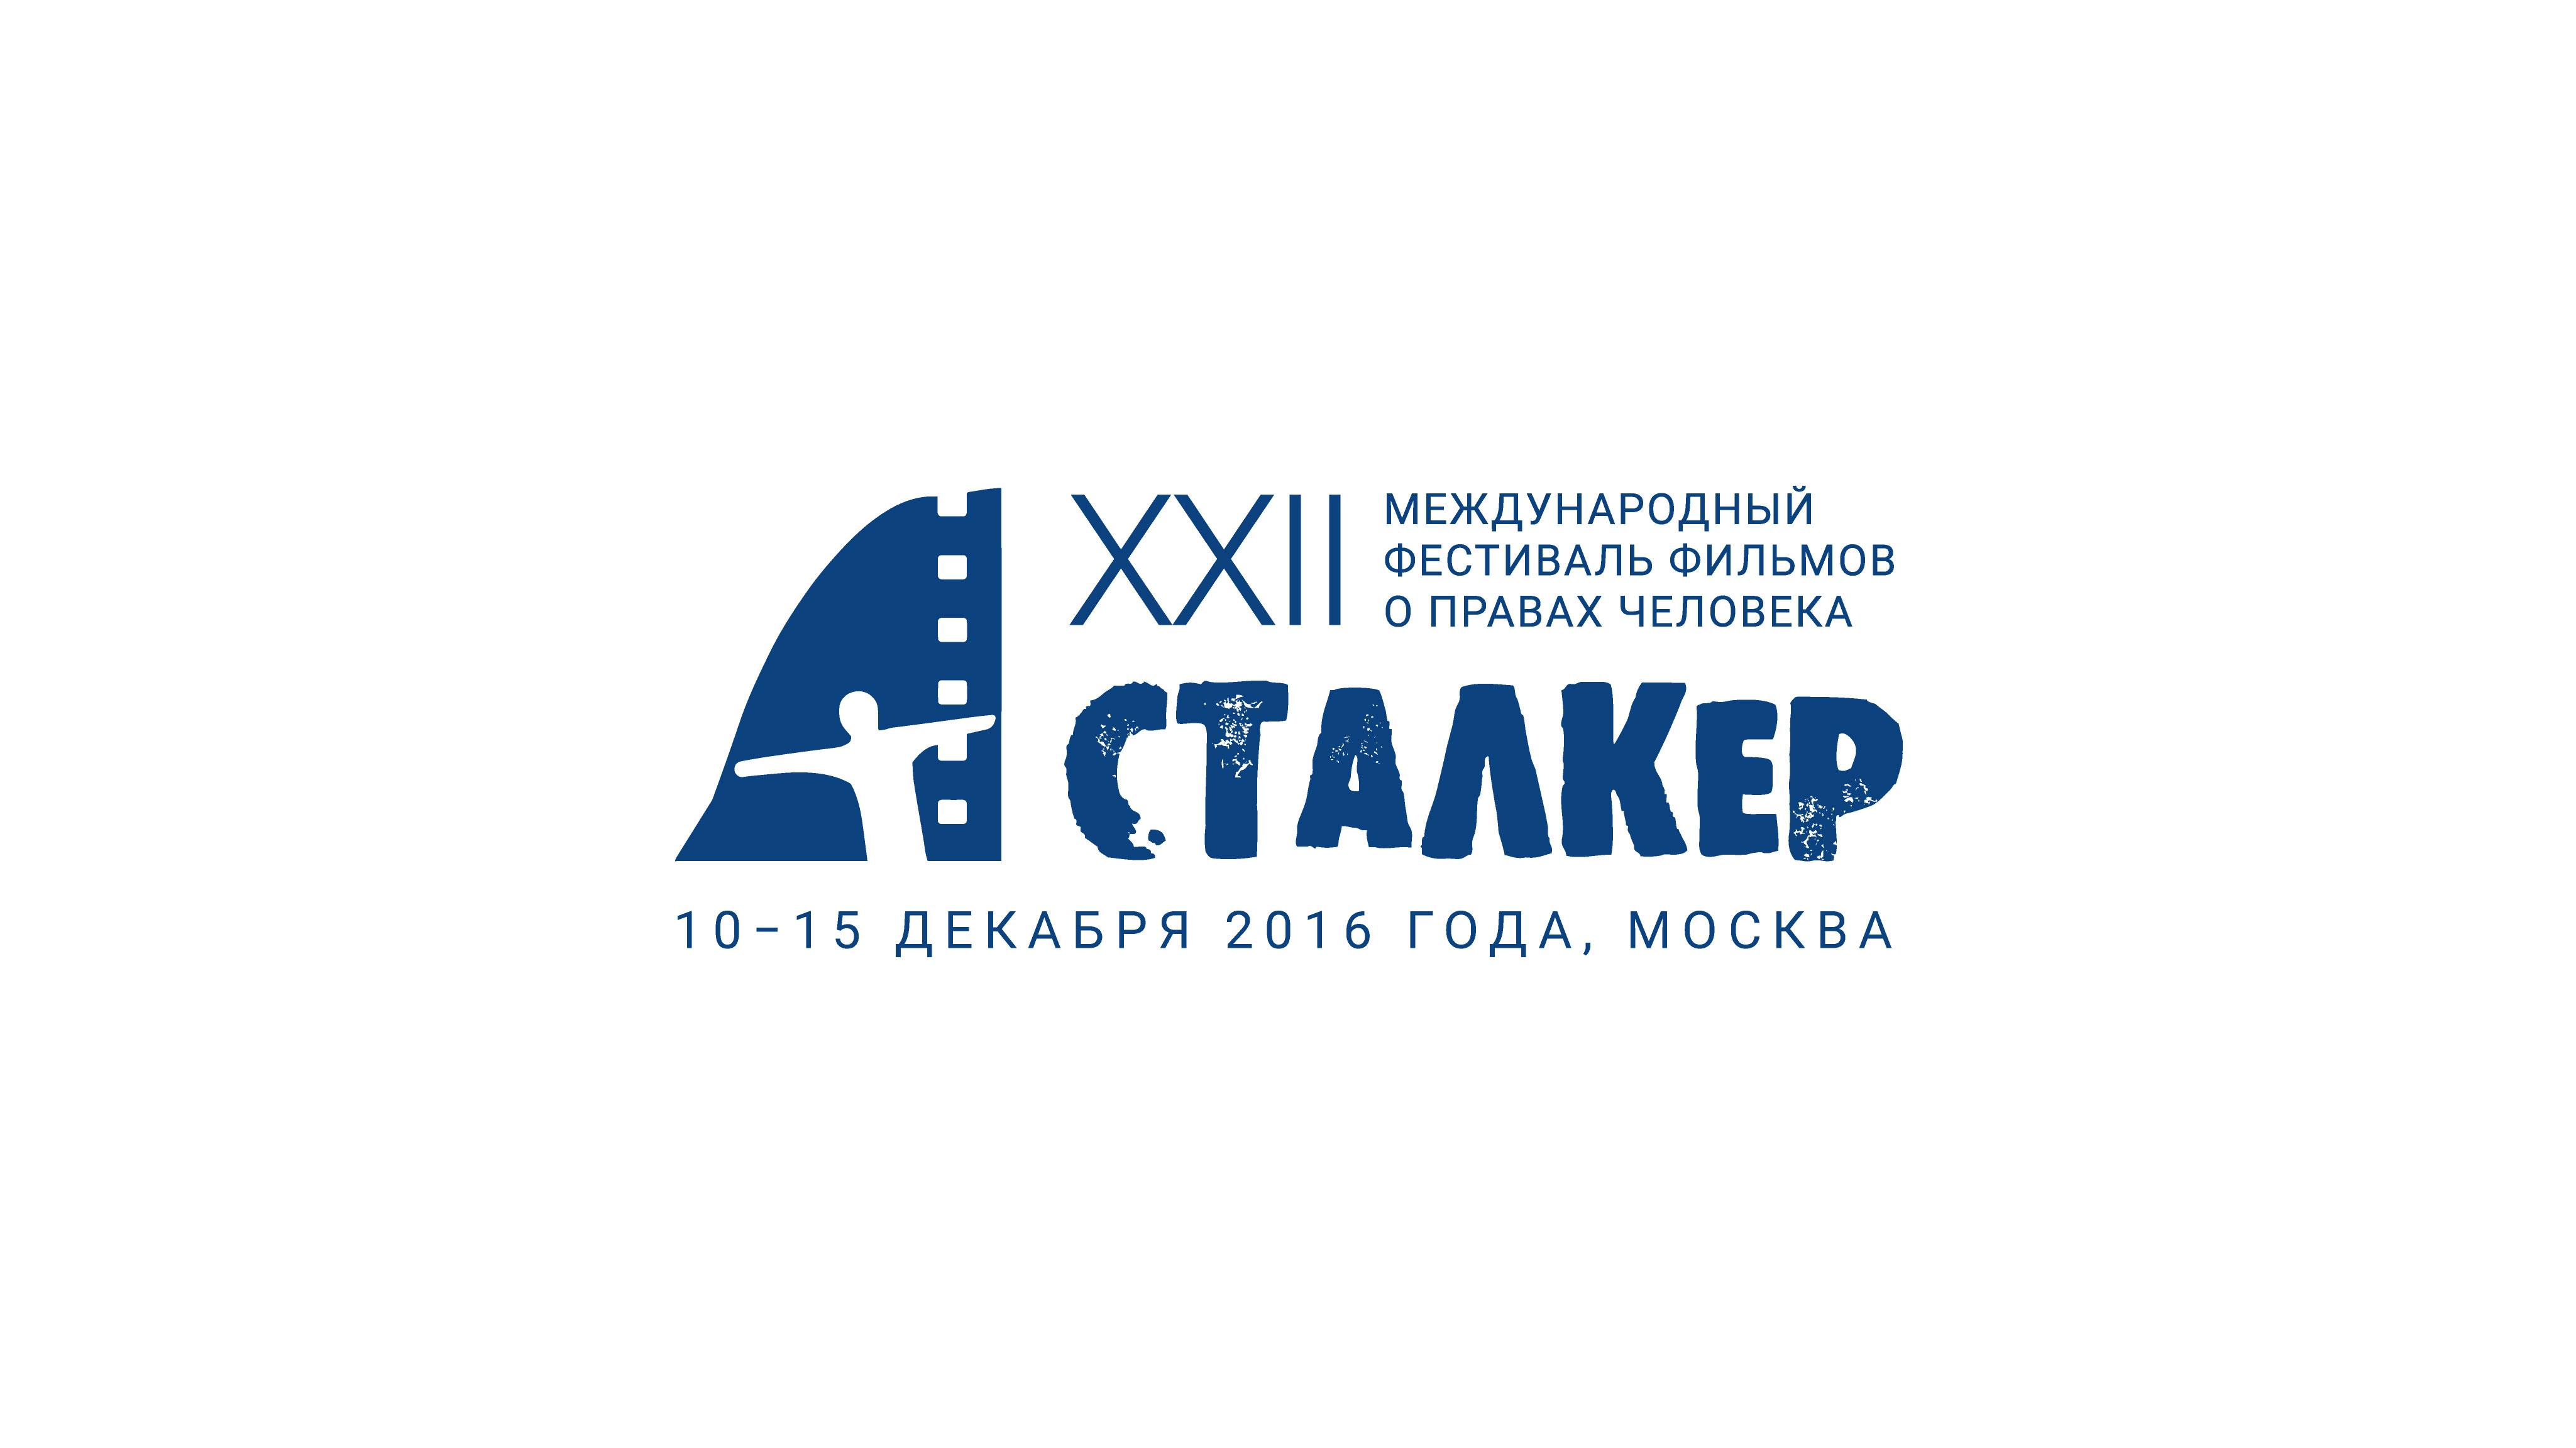 Photo of Эхо Сталкера кинофестиваль сталкер 2016 Эхо Сталкера stalker logo eshill 20161114110734